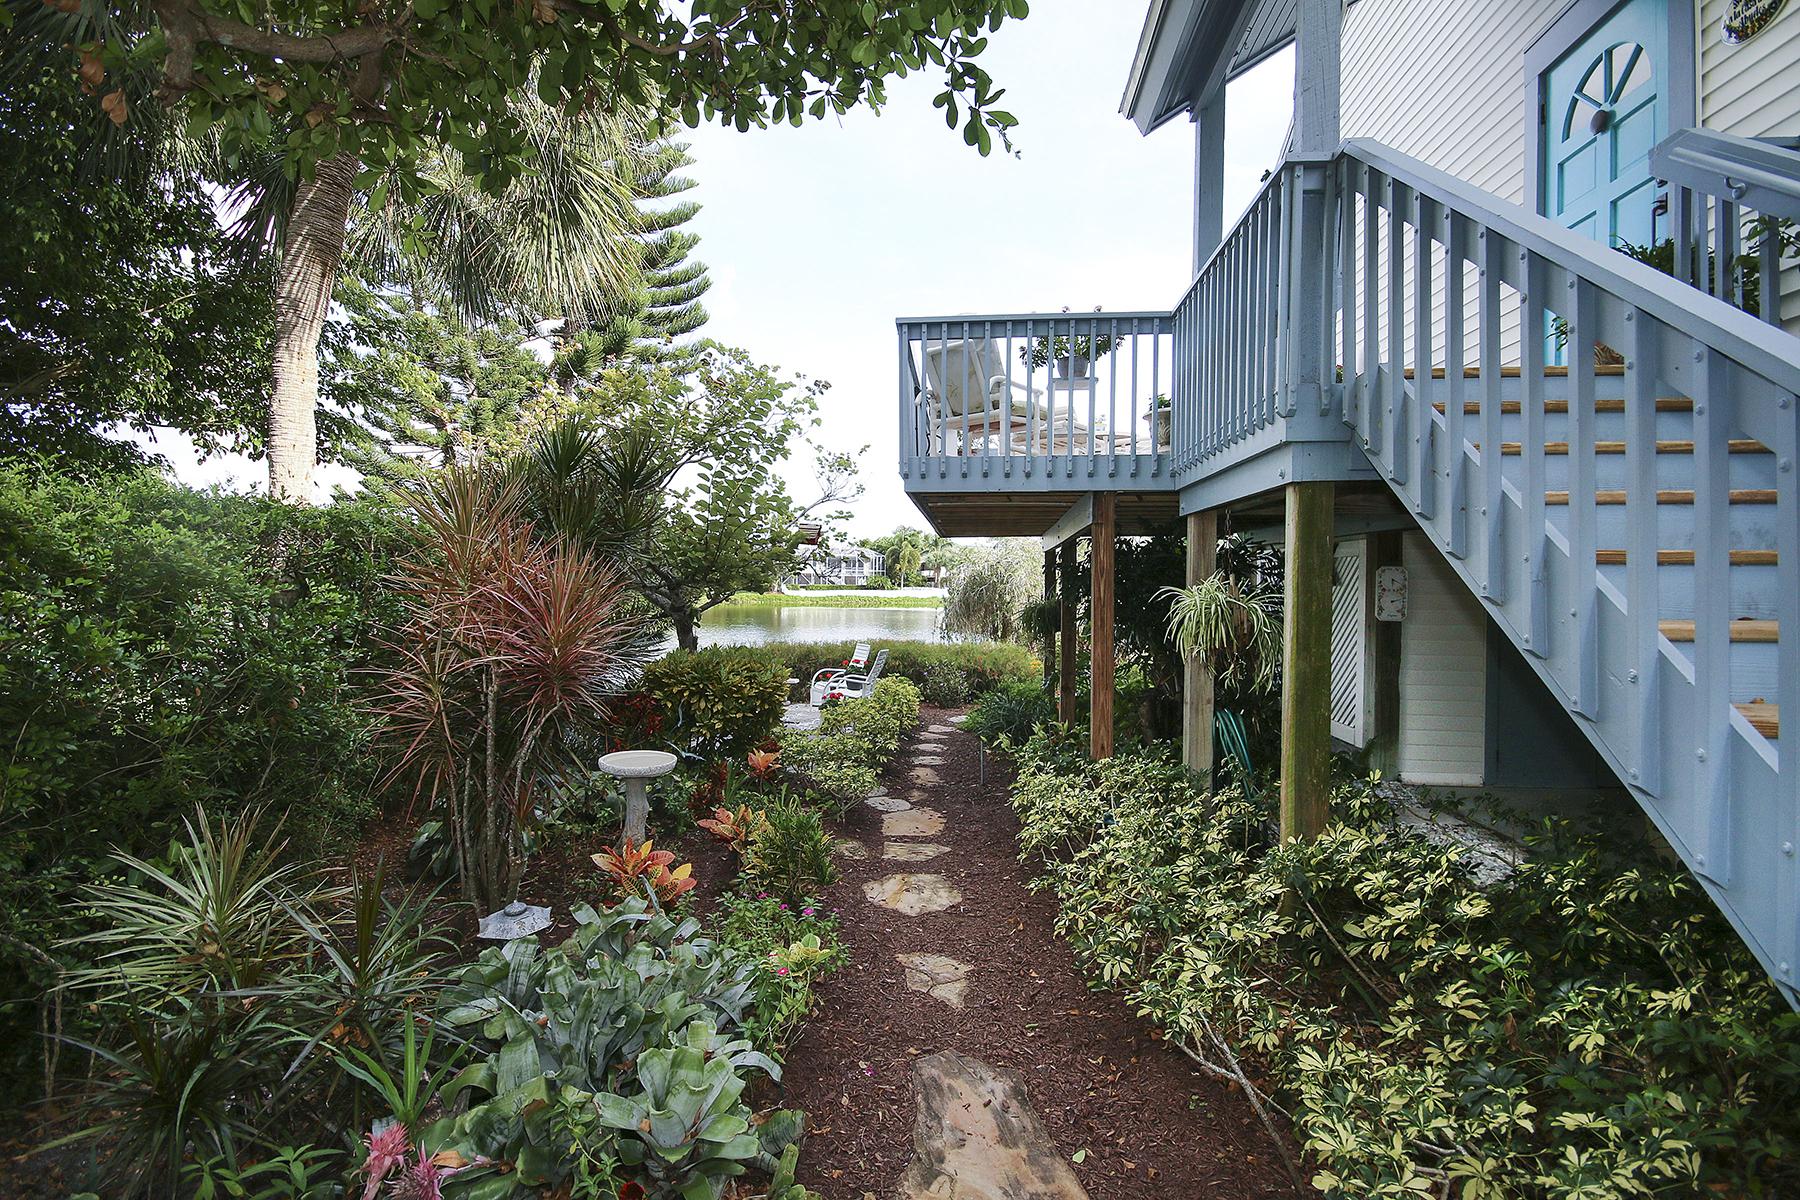 Single Family Home for Sale at DUNES 1429 Sandpiper Cir Sanibel, Florida 33957 United States